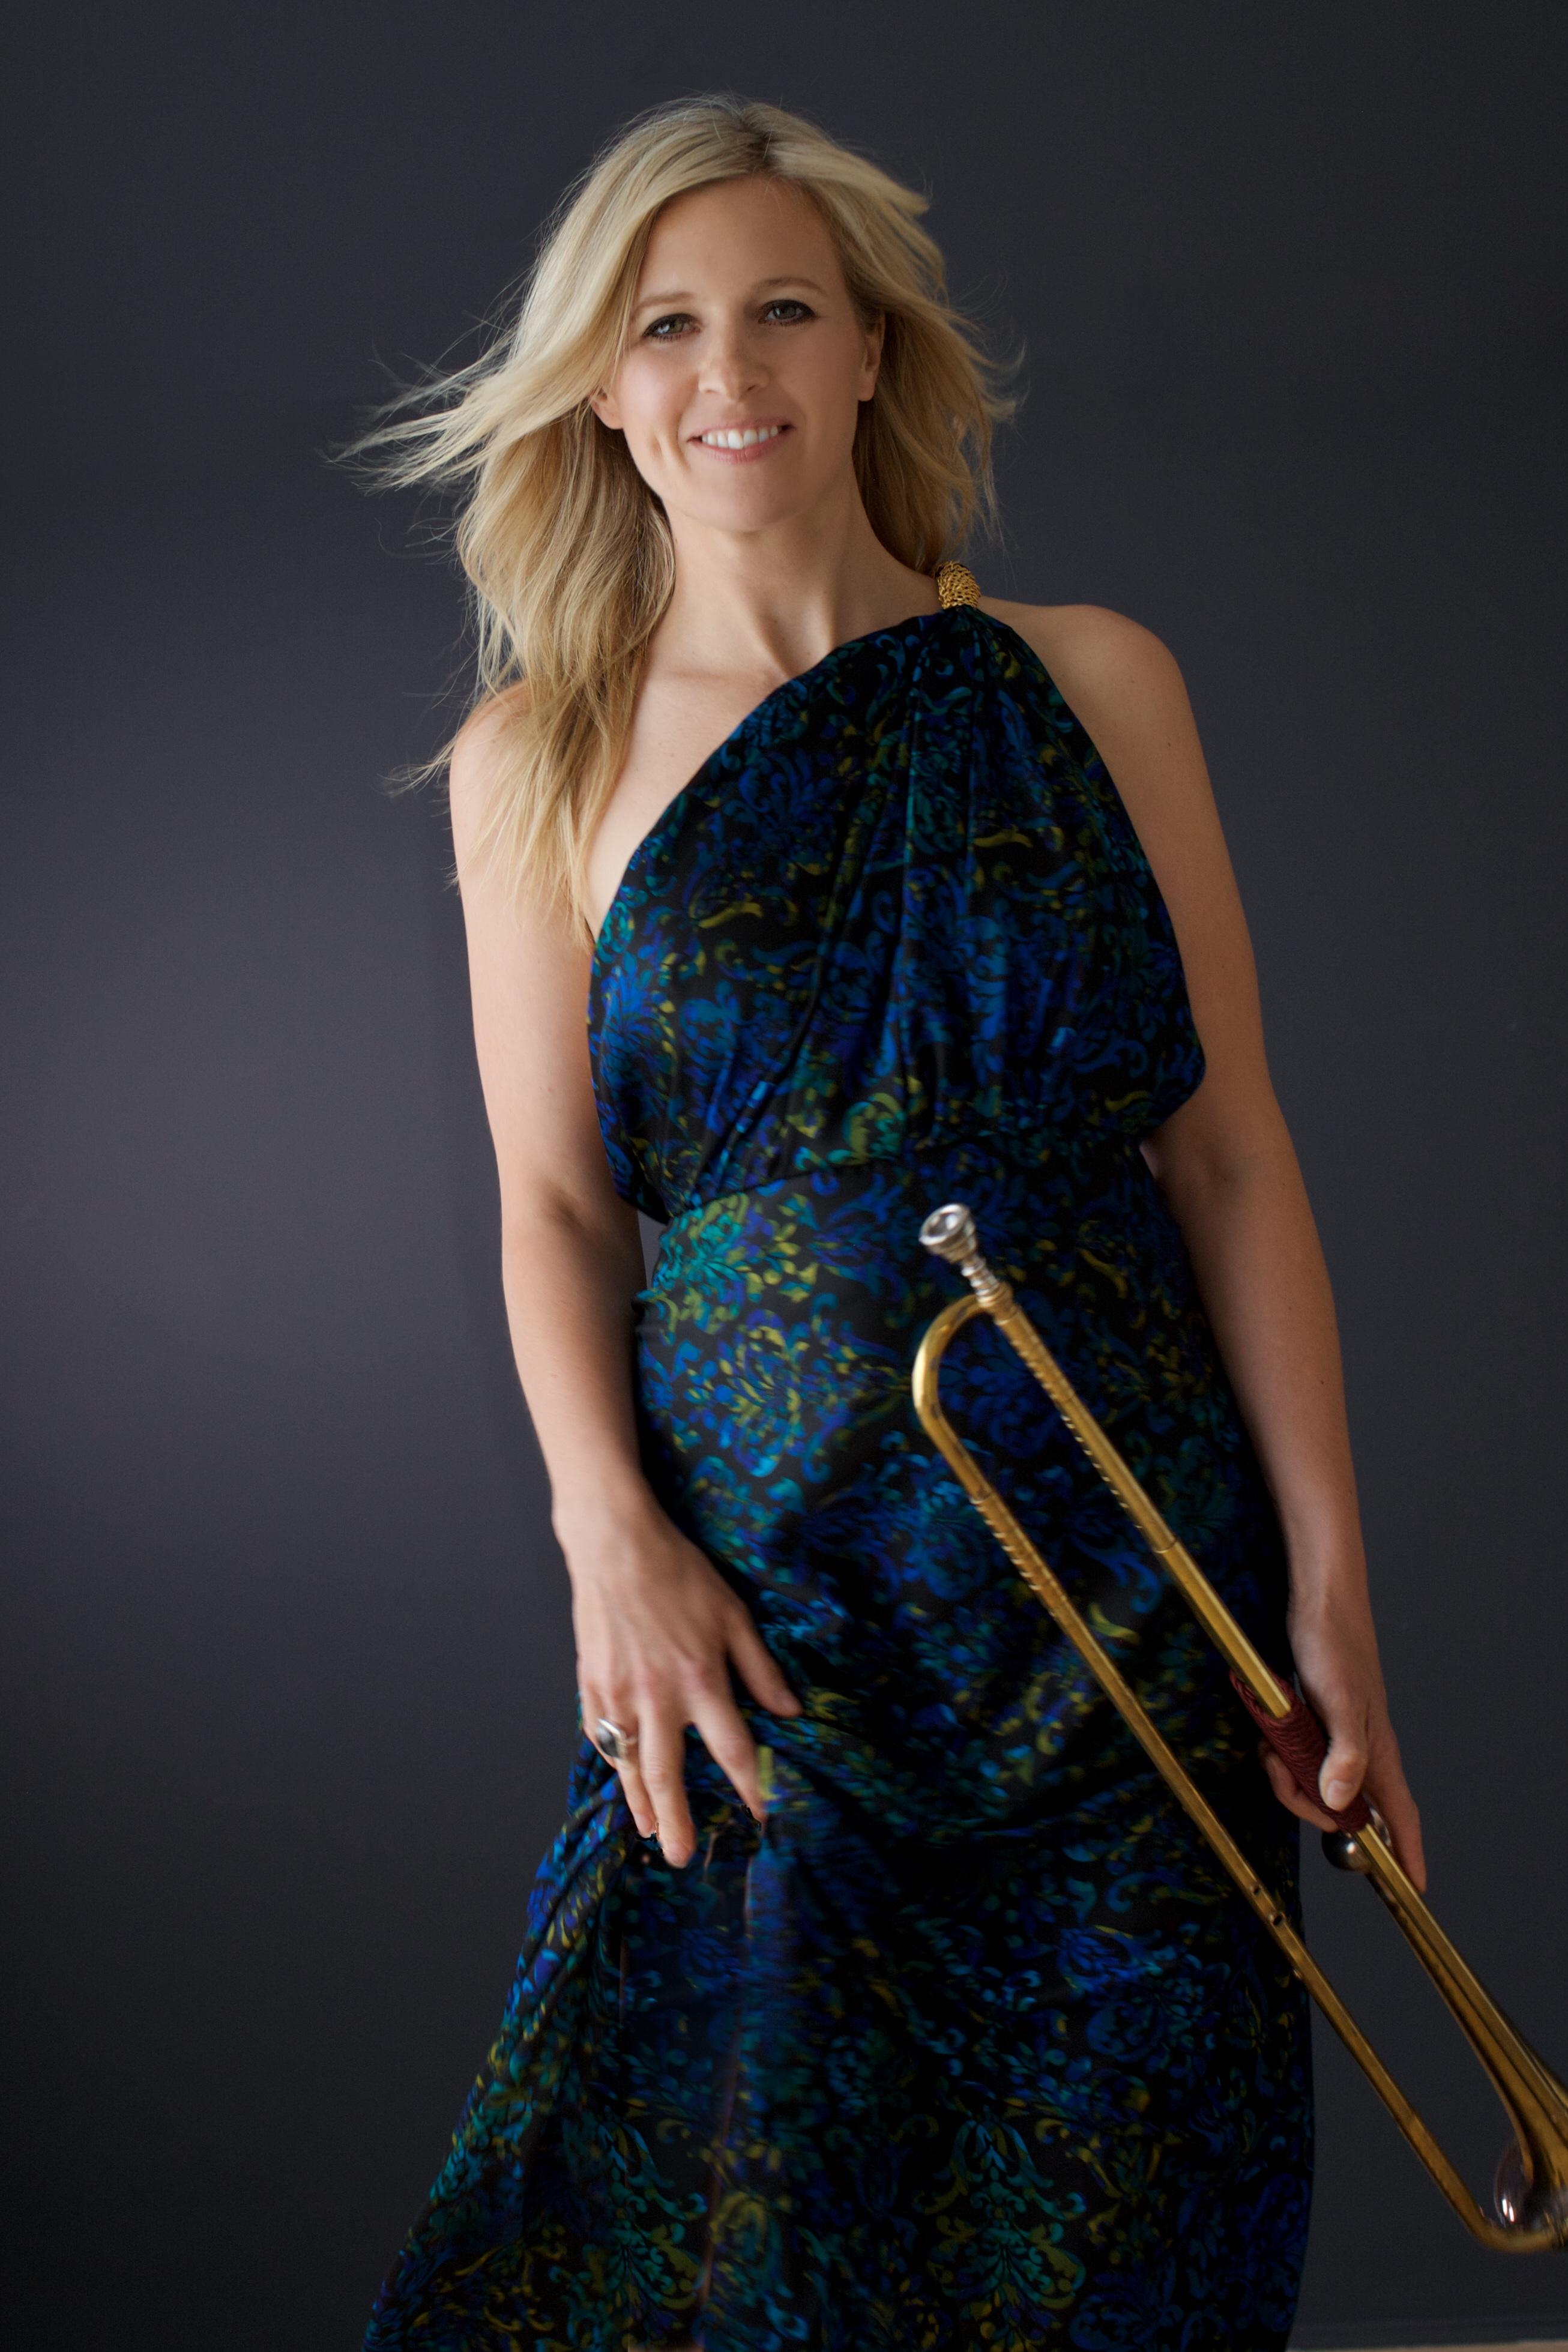 Meet the Artist – Alison Balsom, trumpeter